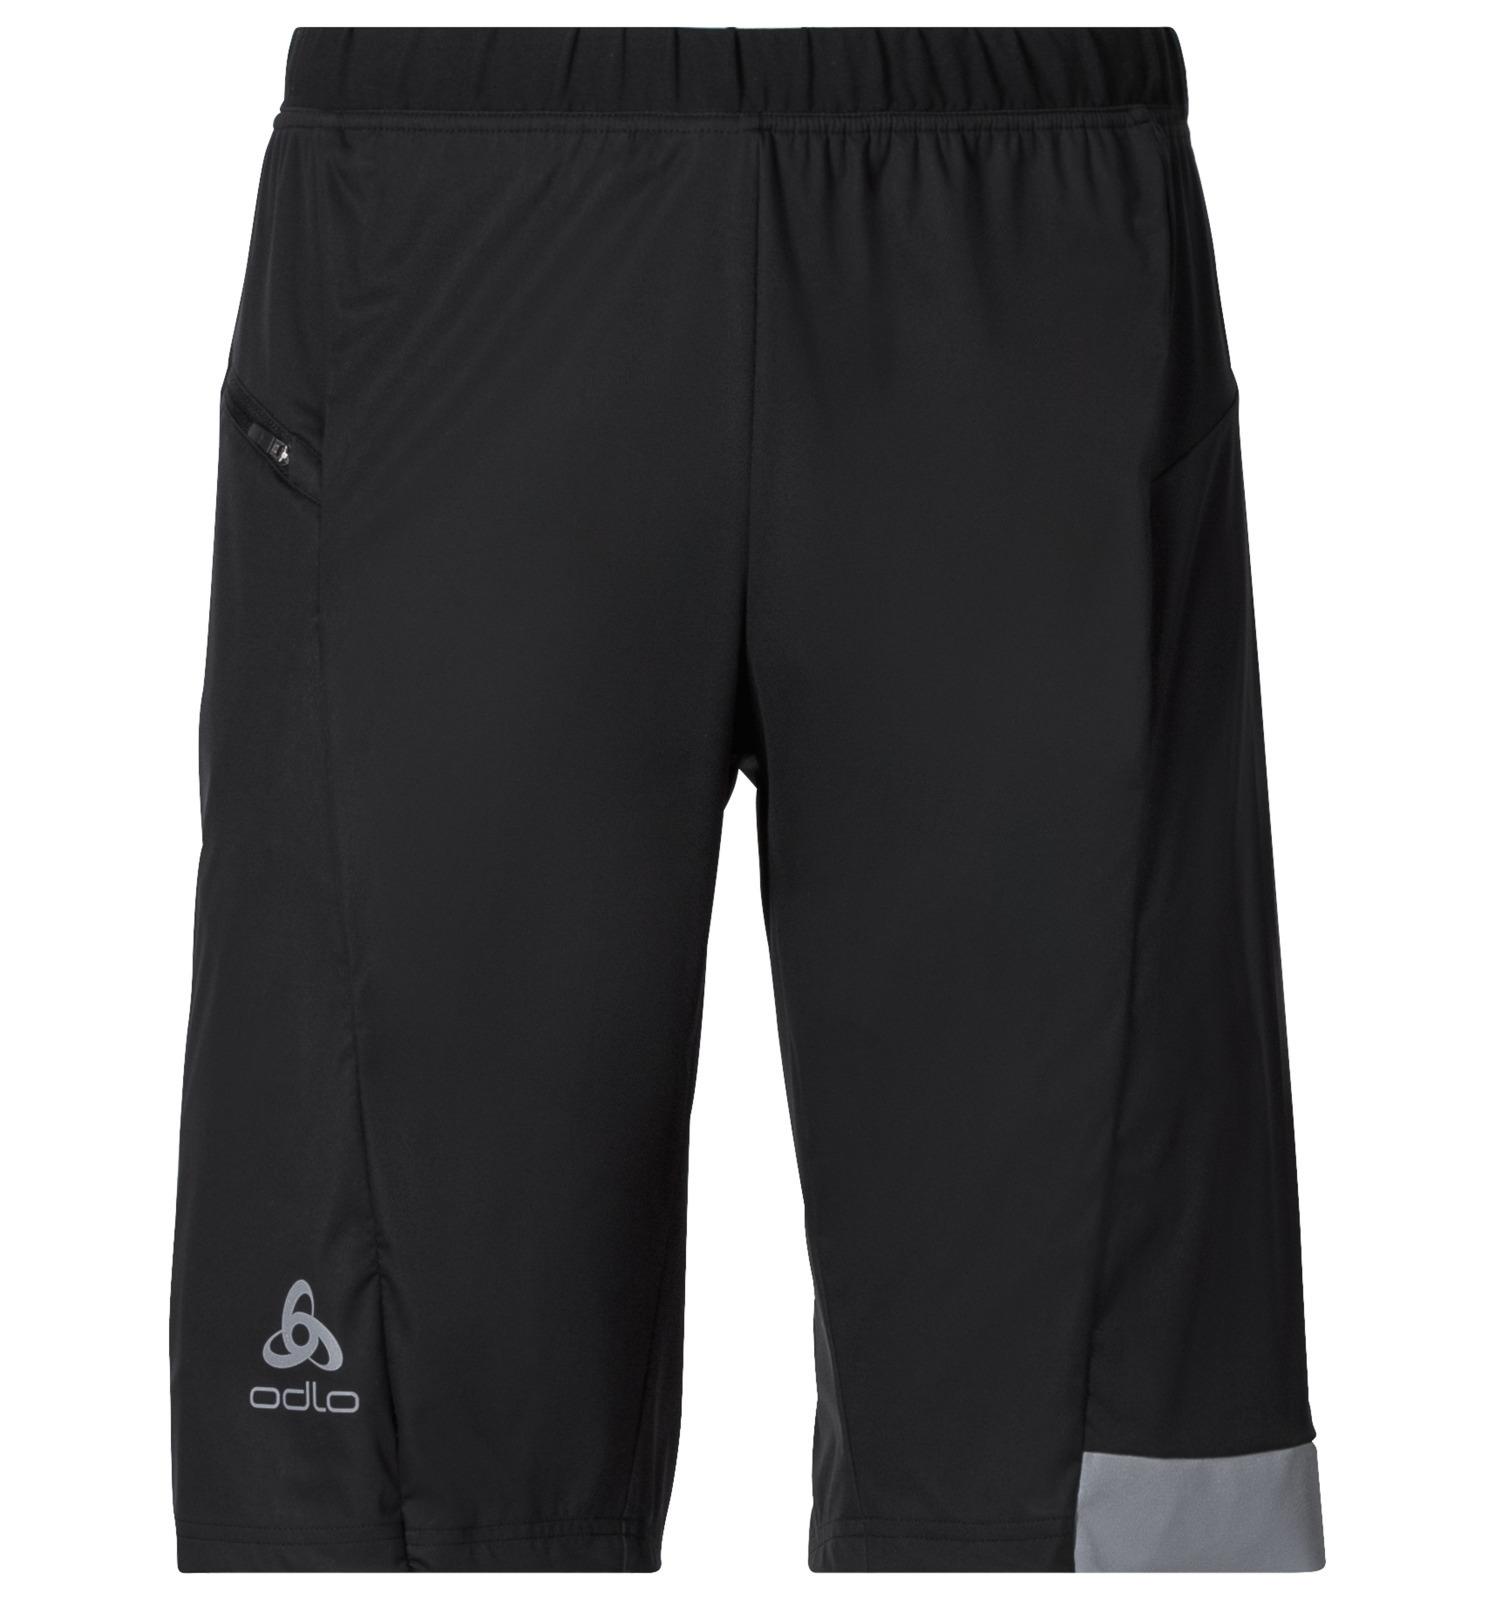 Odlo Odlo Zeroweight Logic shorts in zwart